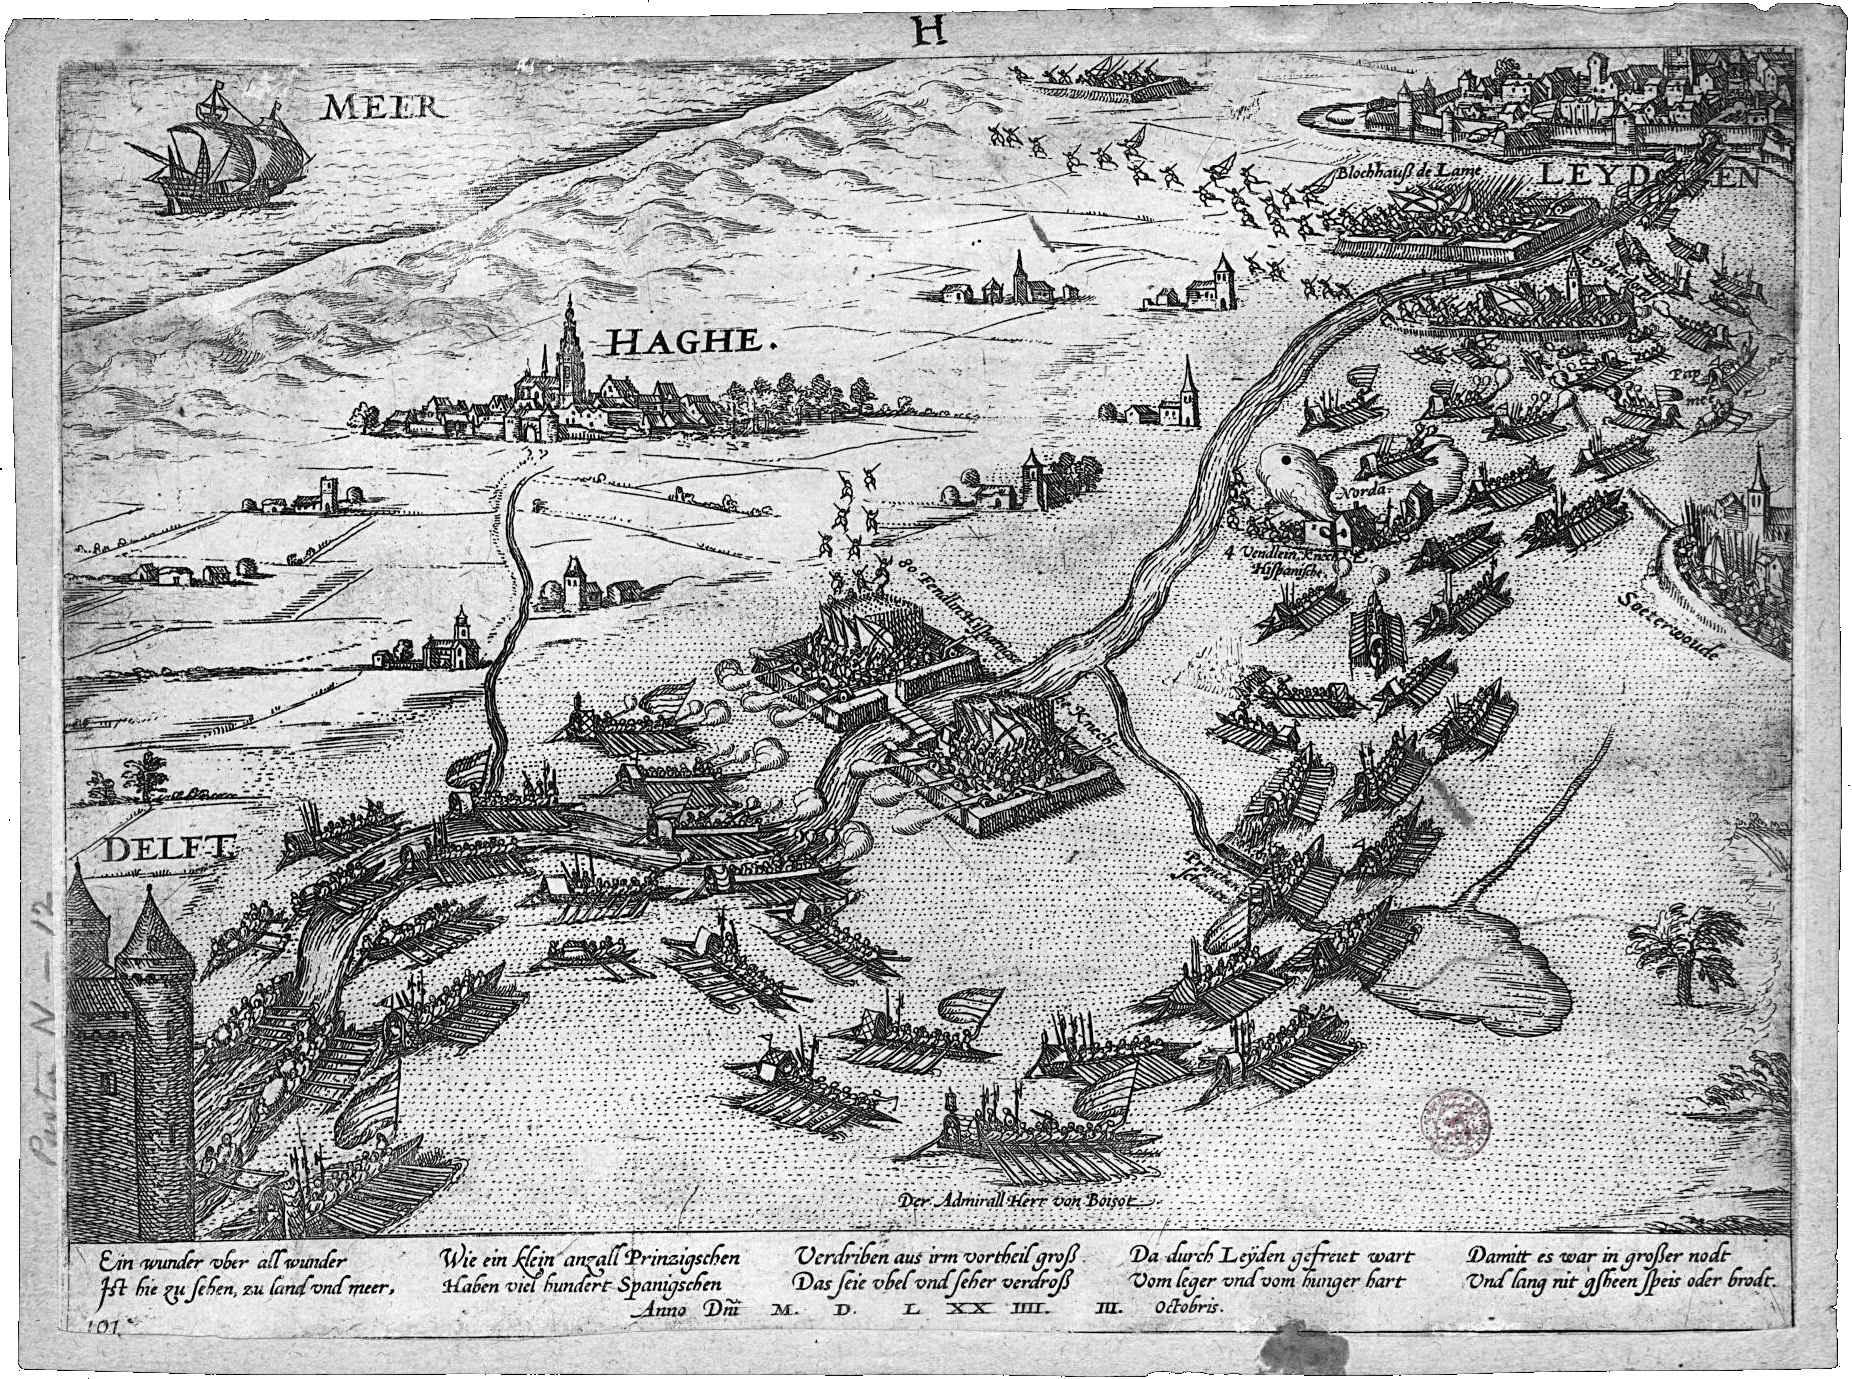 File:1574-10-03; Haghe, Leyden, Delft (Siege of